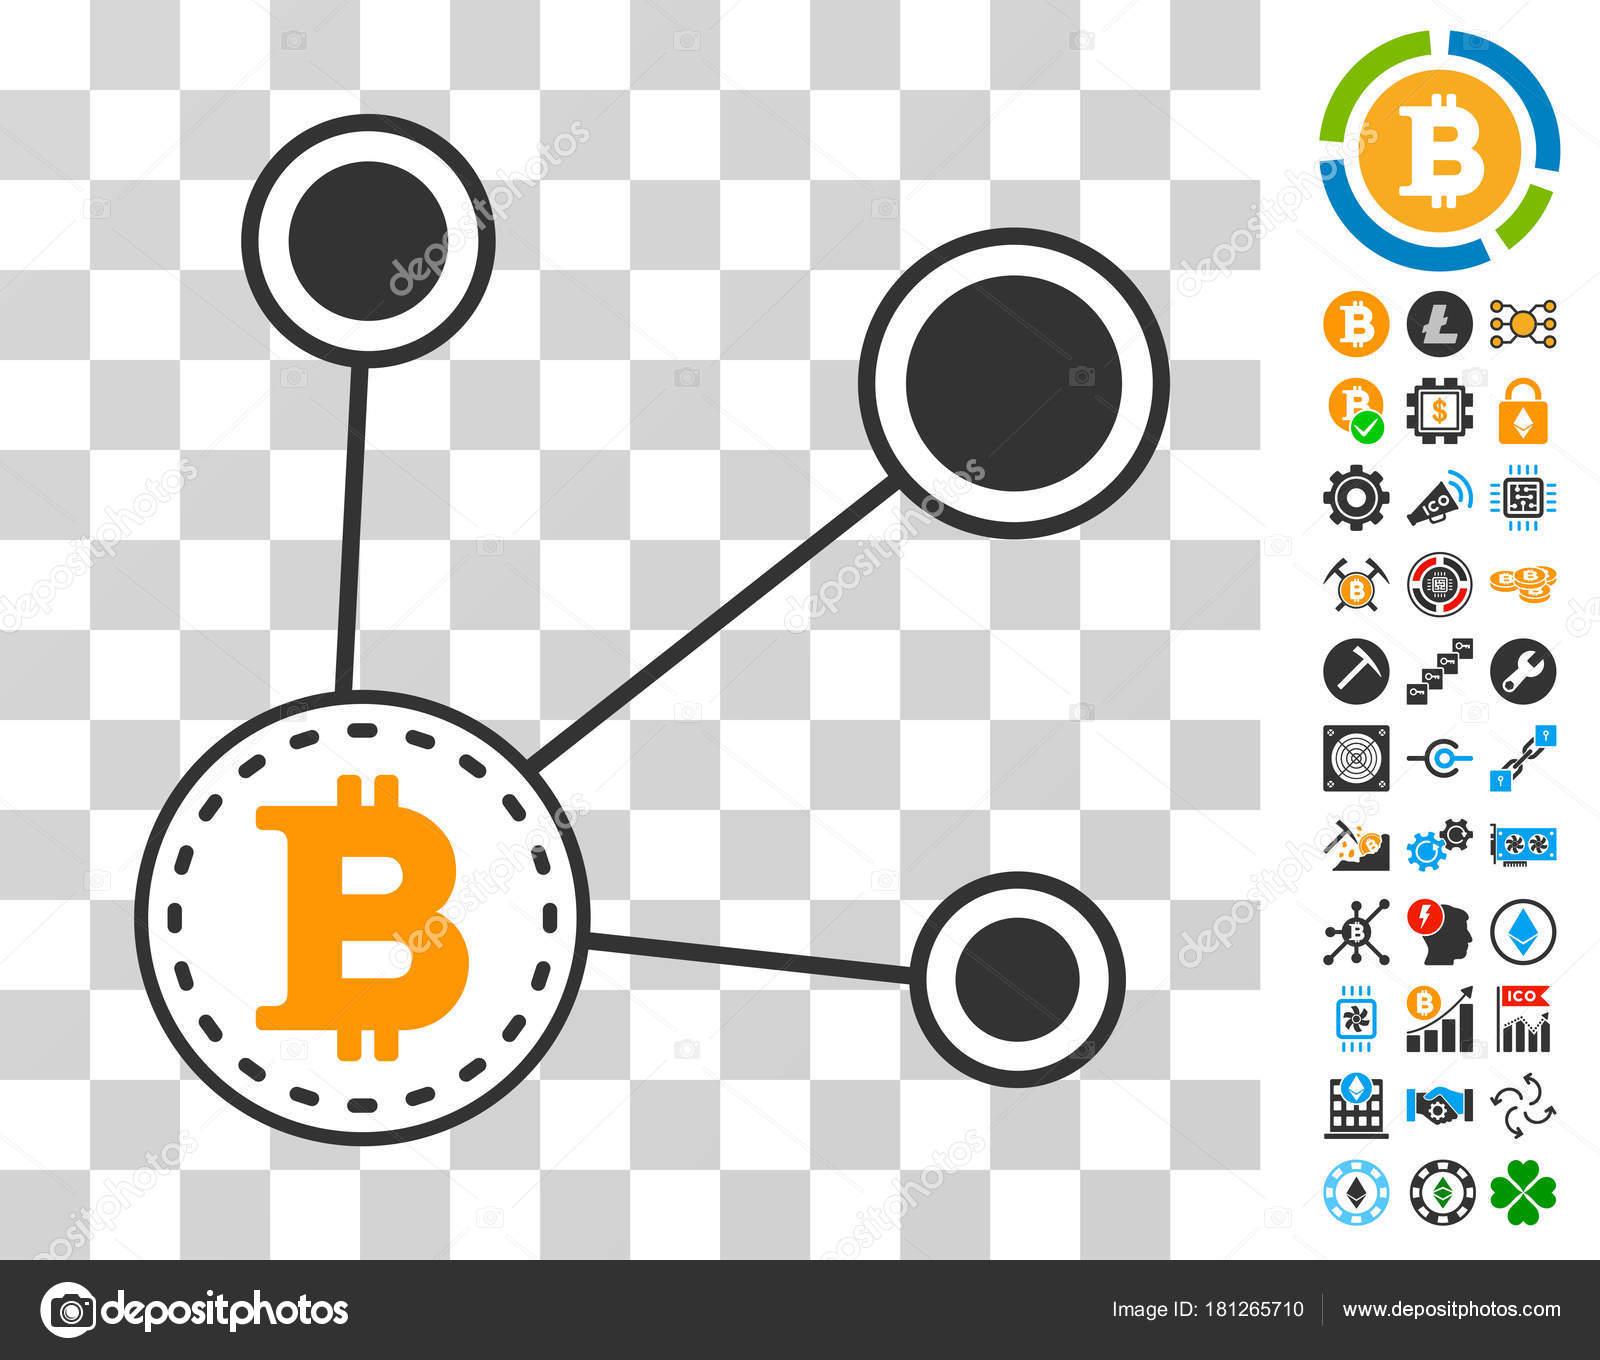 Bitcoin Node Connect Icon with Bonus — Stock Vector © ahasoft #181265710